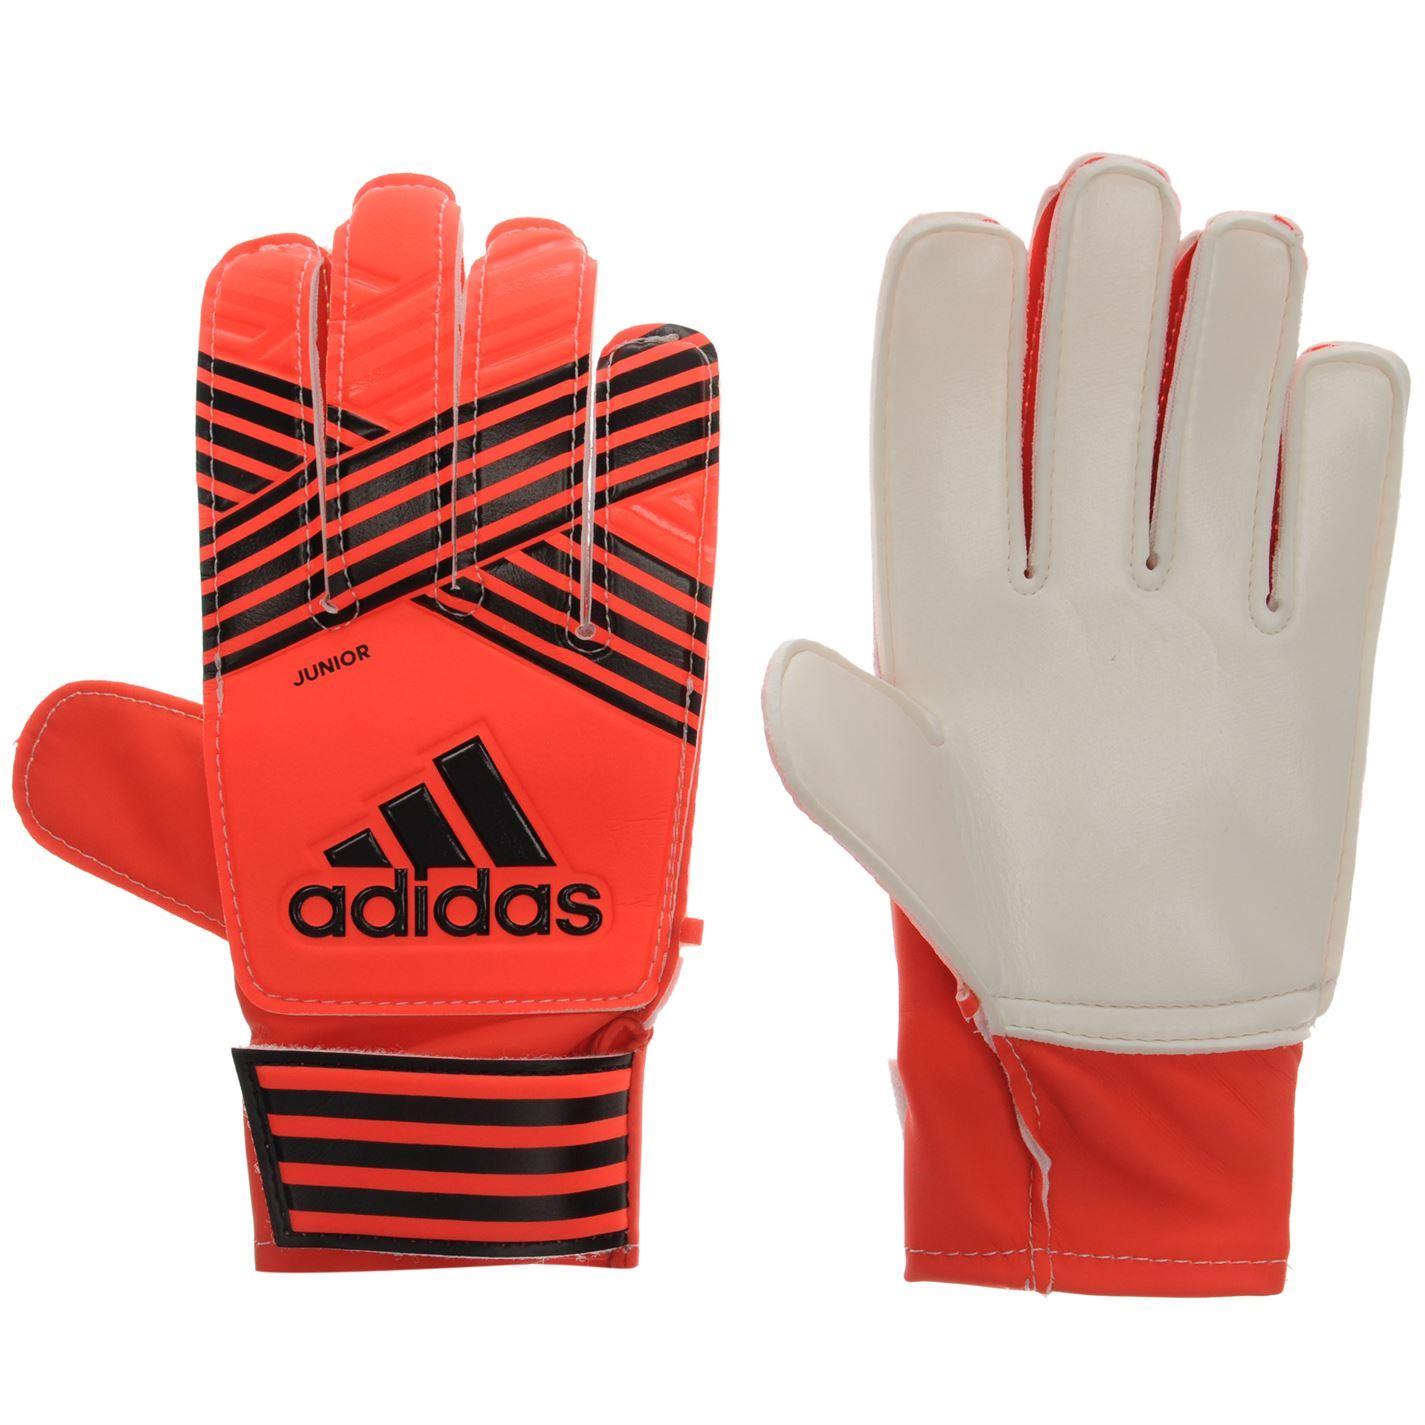 Adidas Kids Ace Junior Goalkeeper Gloves Sports Football Accessories